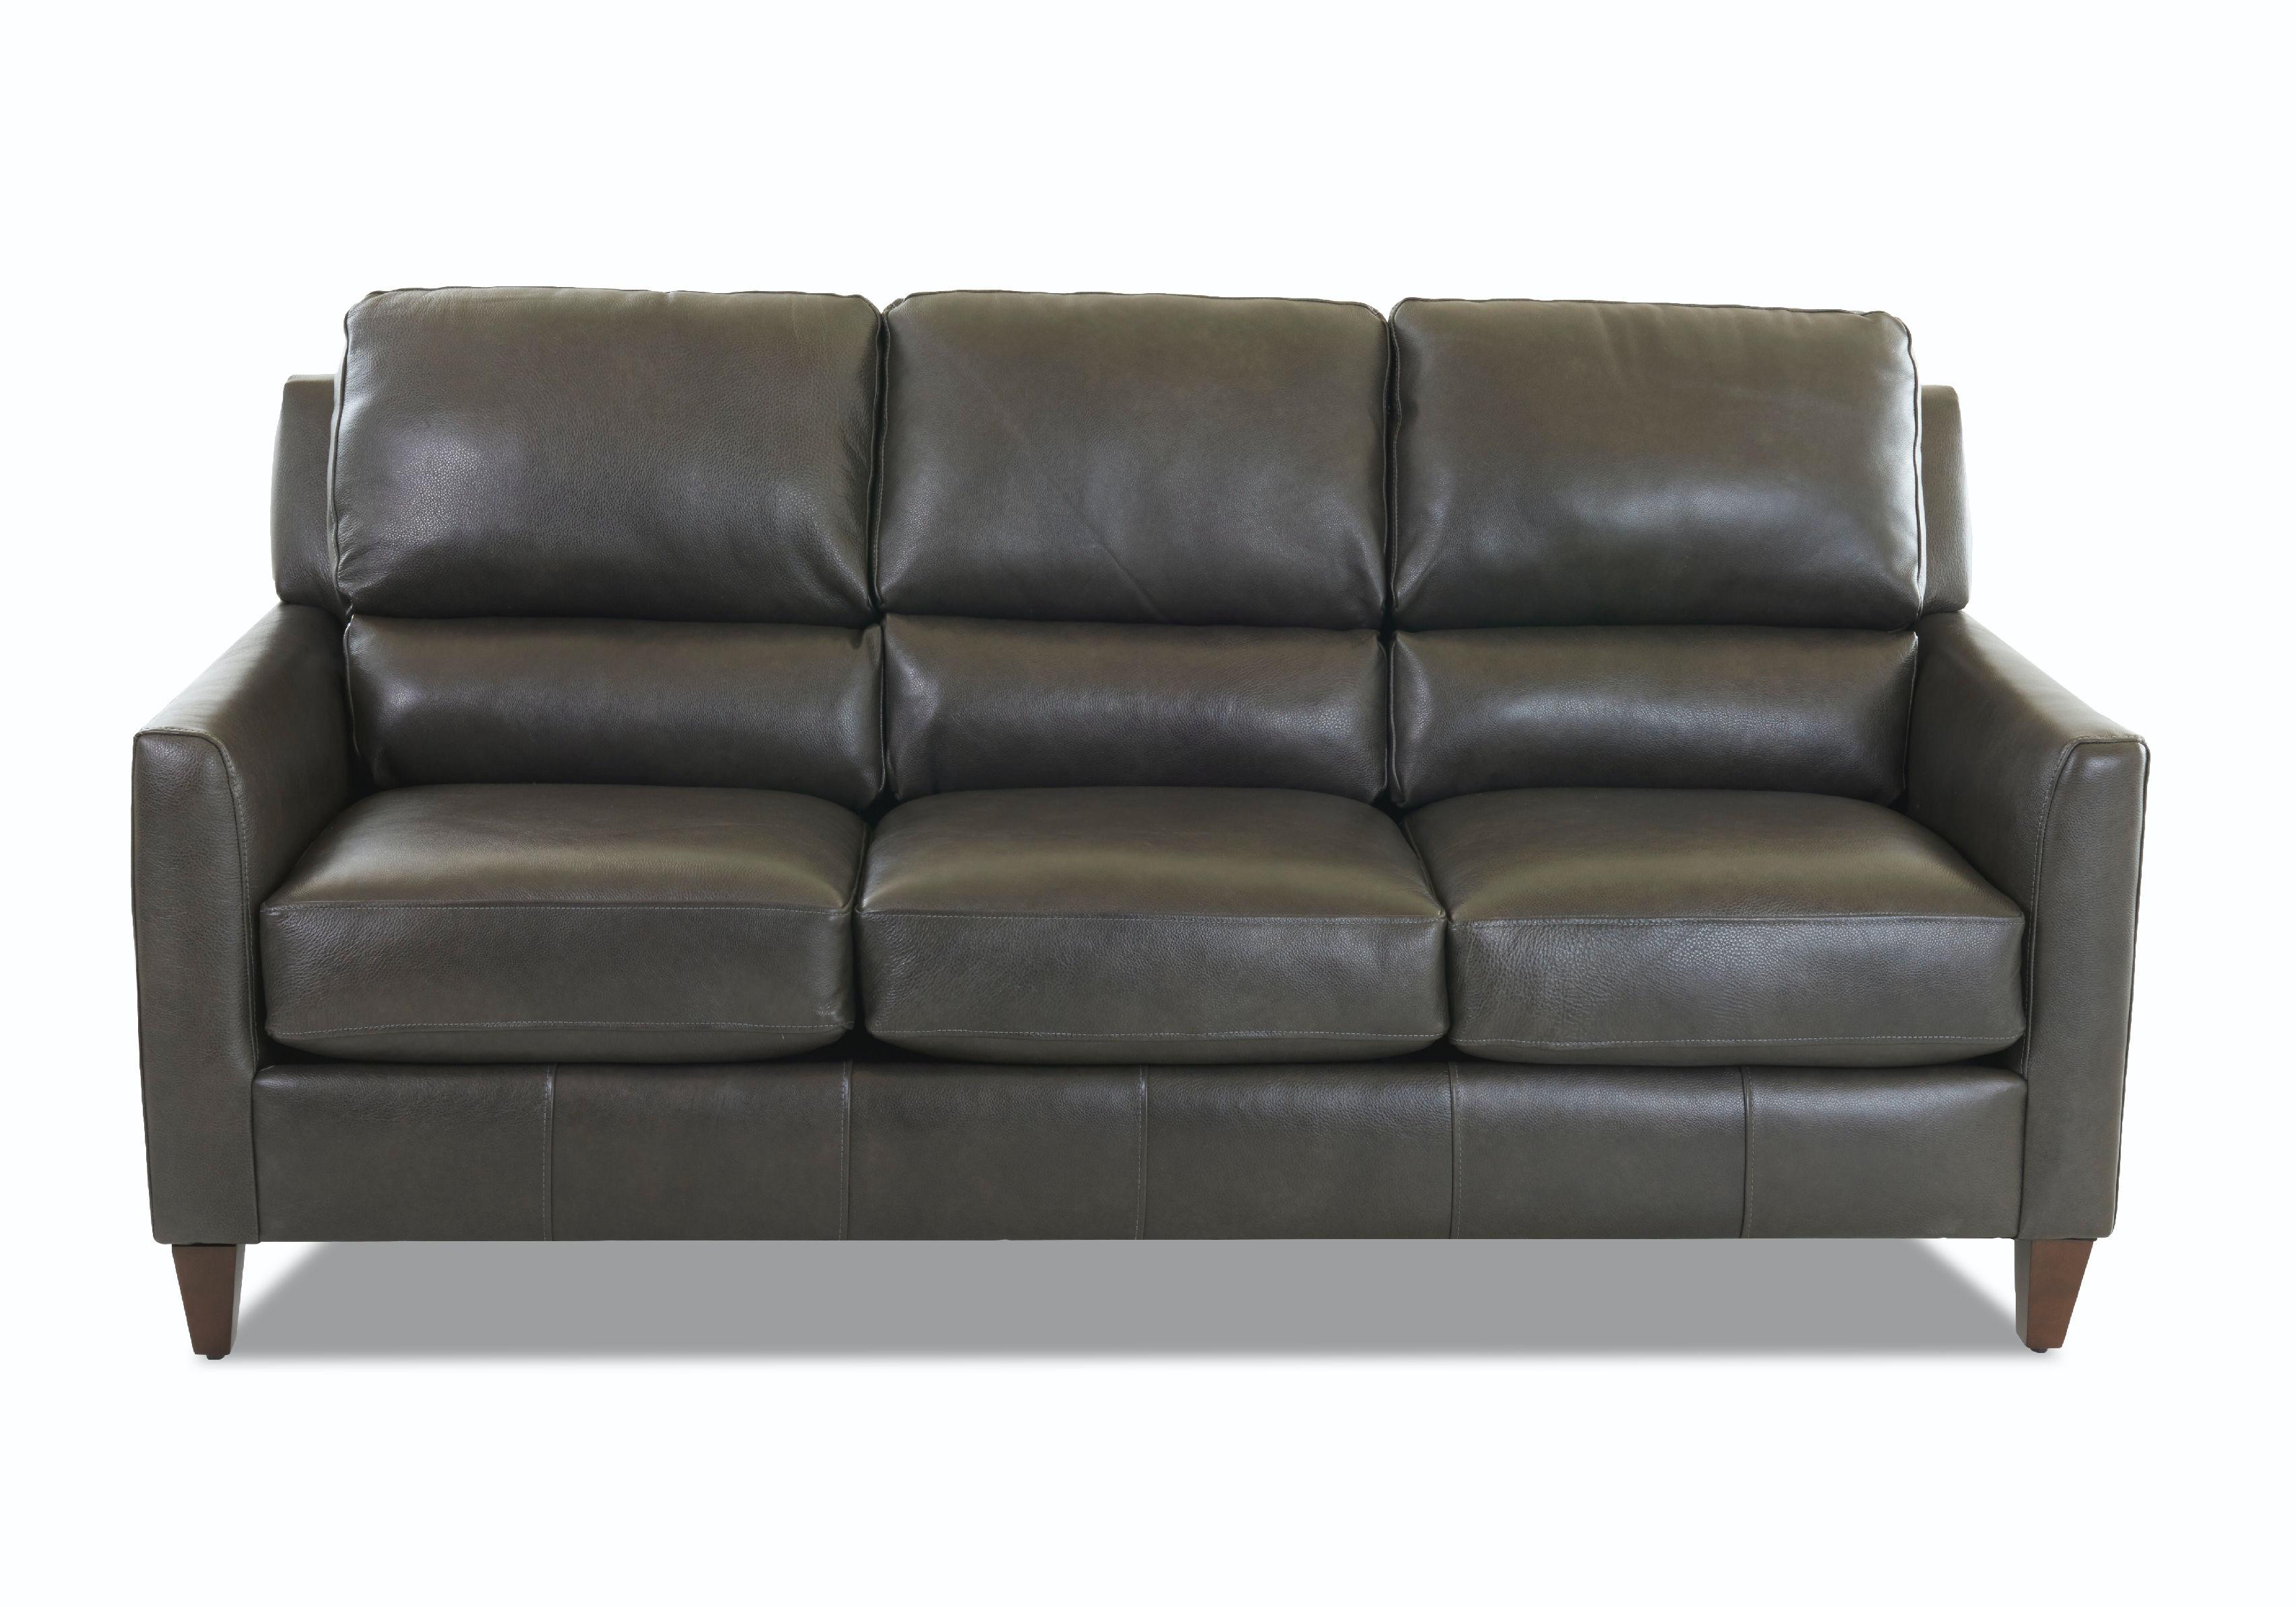 Klaussner Living Room Cortland LT95700 S   Furniture Kingdom   Gainesville,  FL